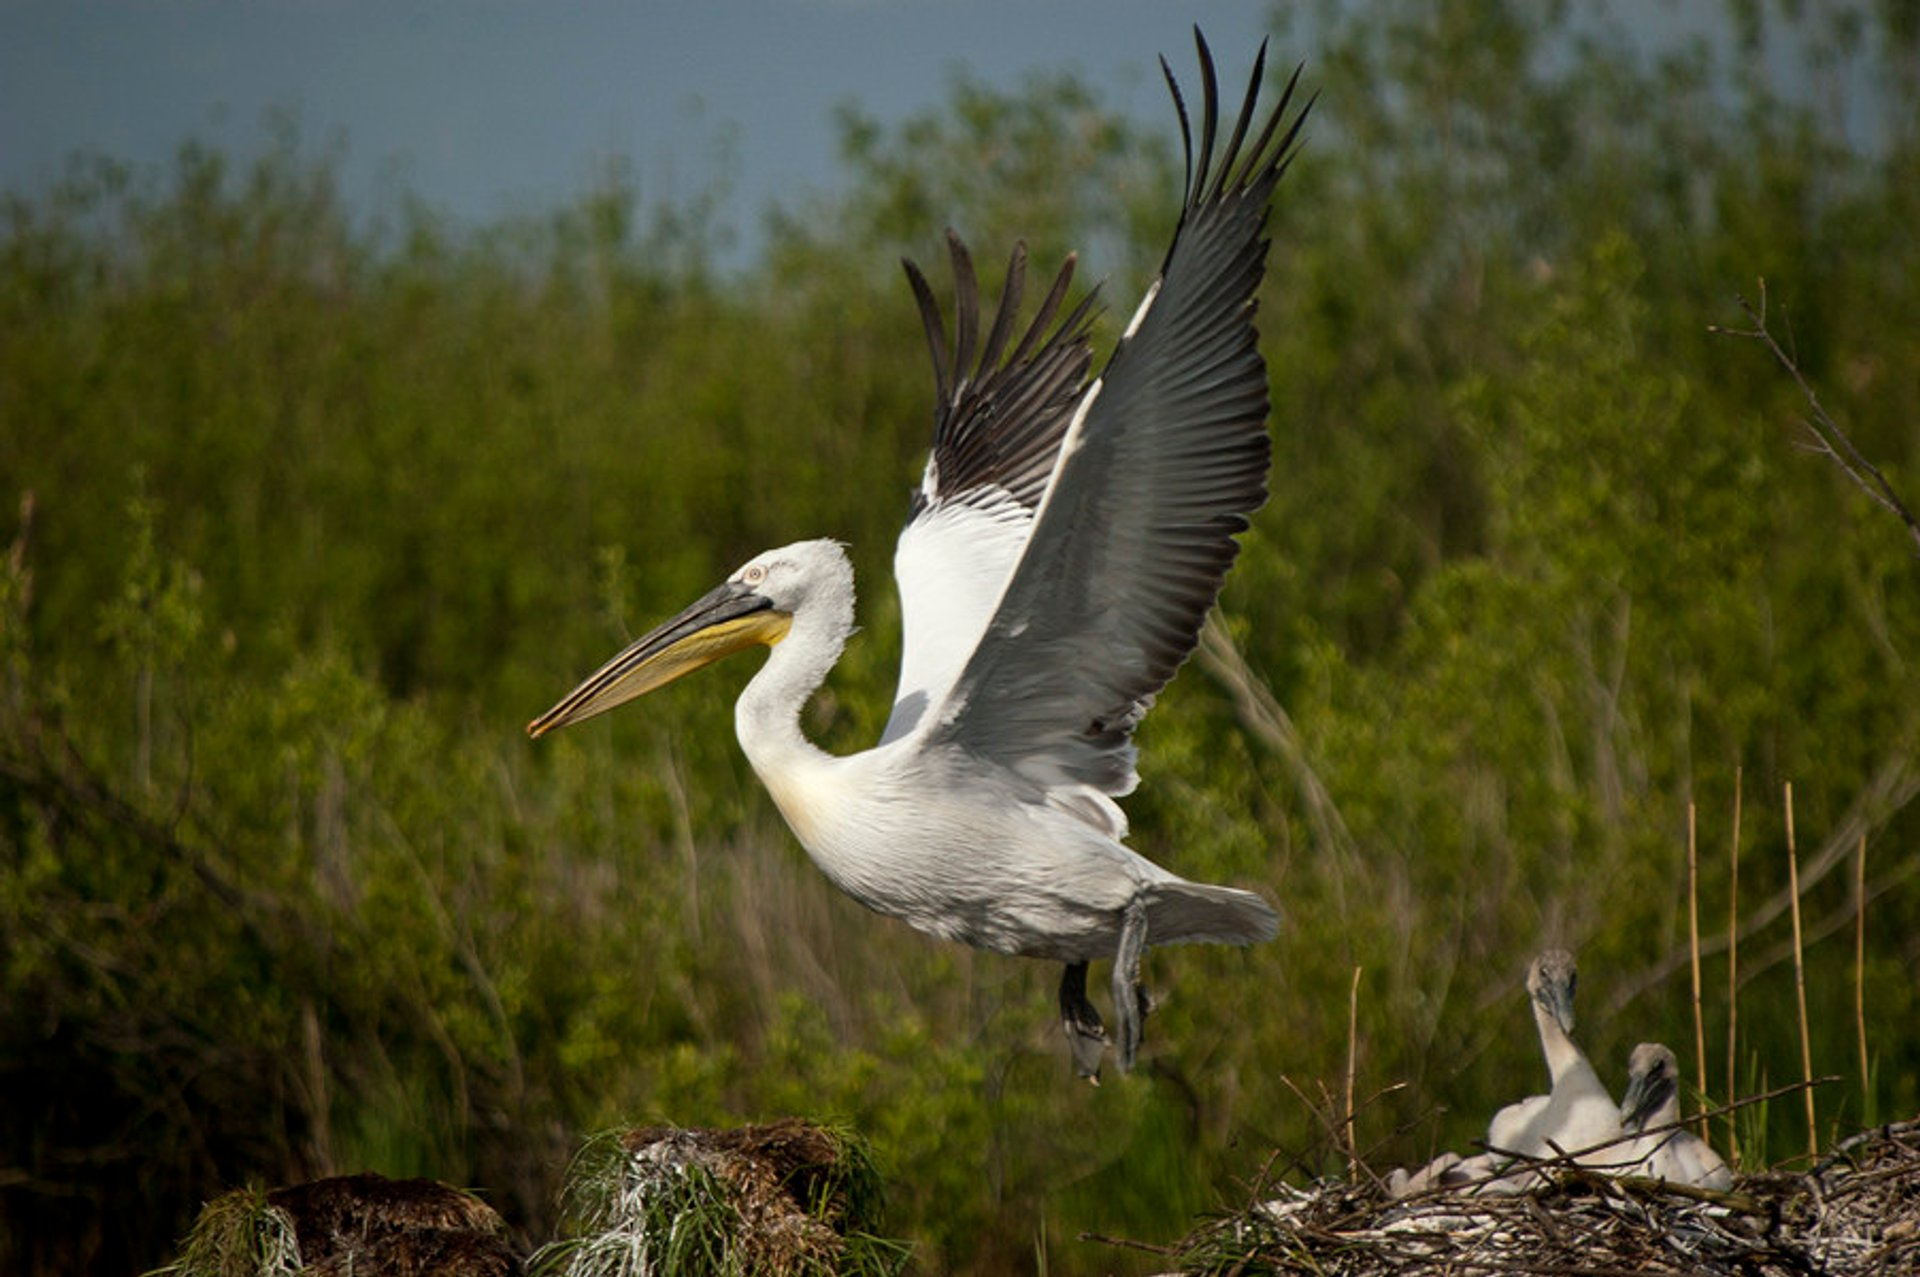 Birdwatching in Montenegro 2020 - Best Time